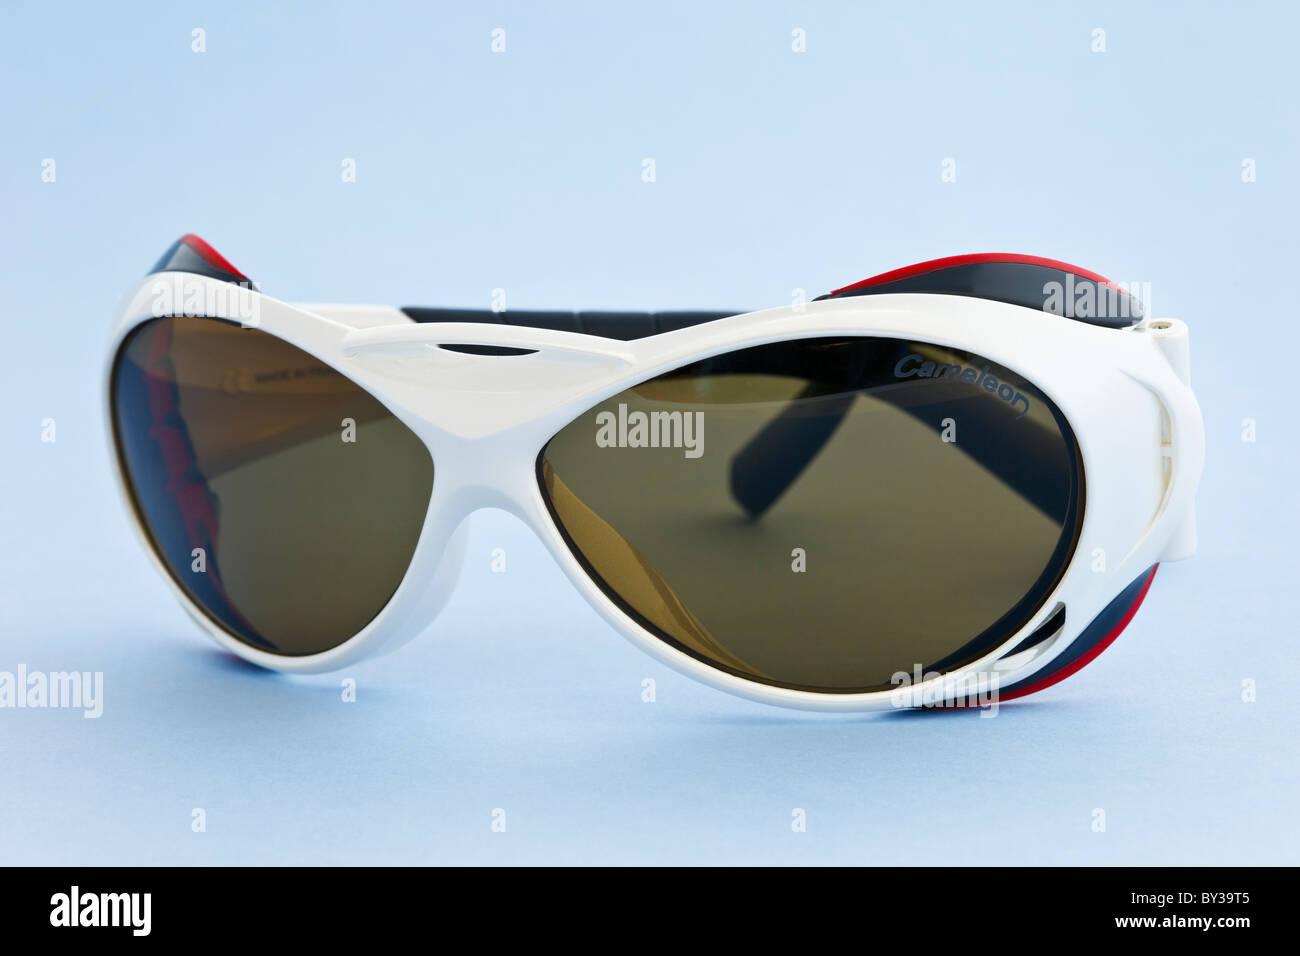 6255cdcc586 Julbo Explorer glacier sunglasses with Cameleon photochromic dark lenses on  a blue background